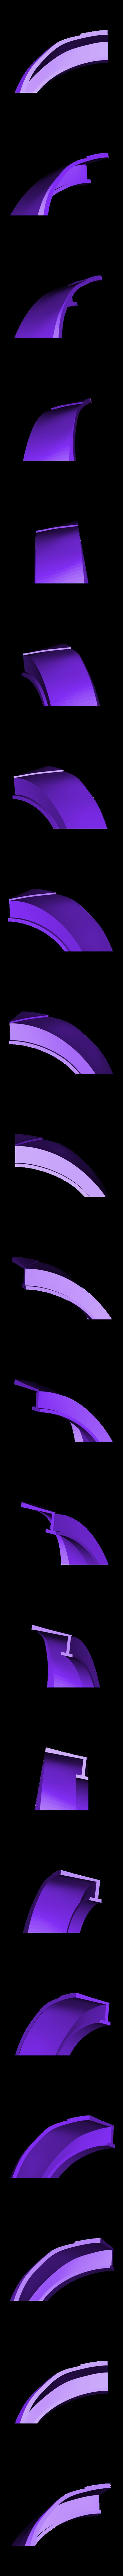 Part 4 v1.stl Download STL file ARF Trooper Helmet • 3D print object, VillainousPropShop